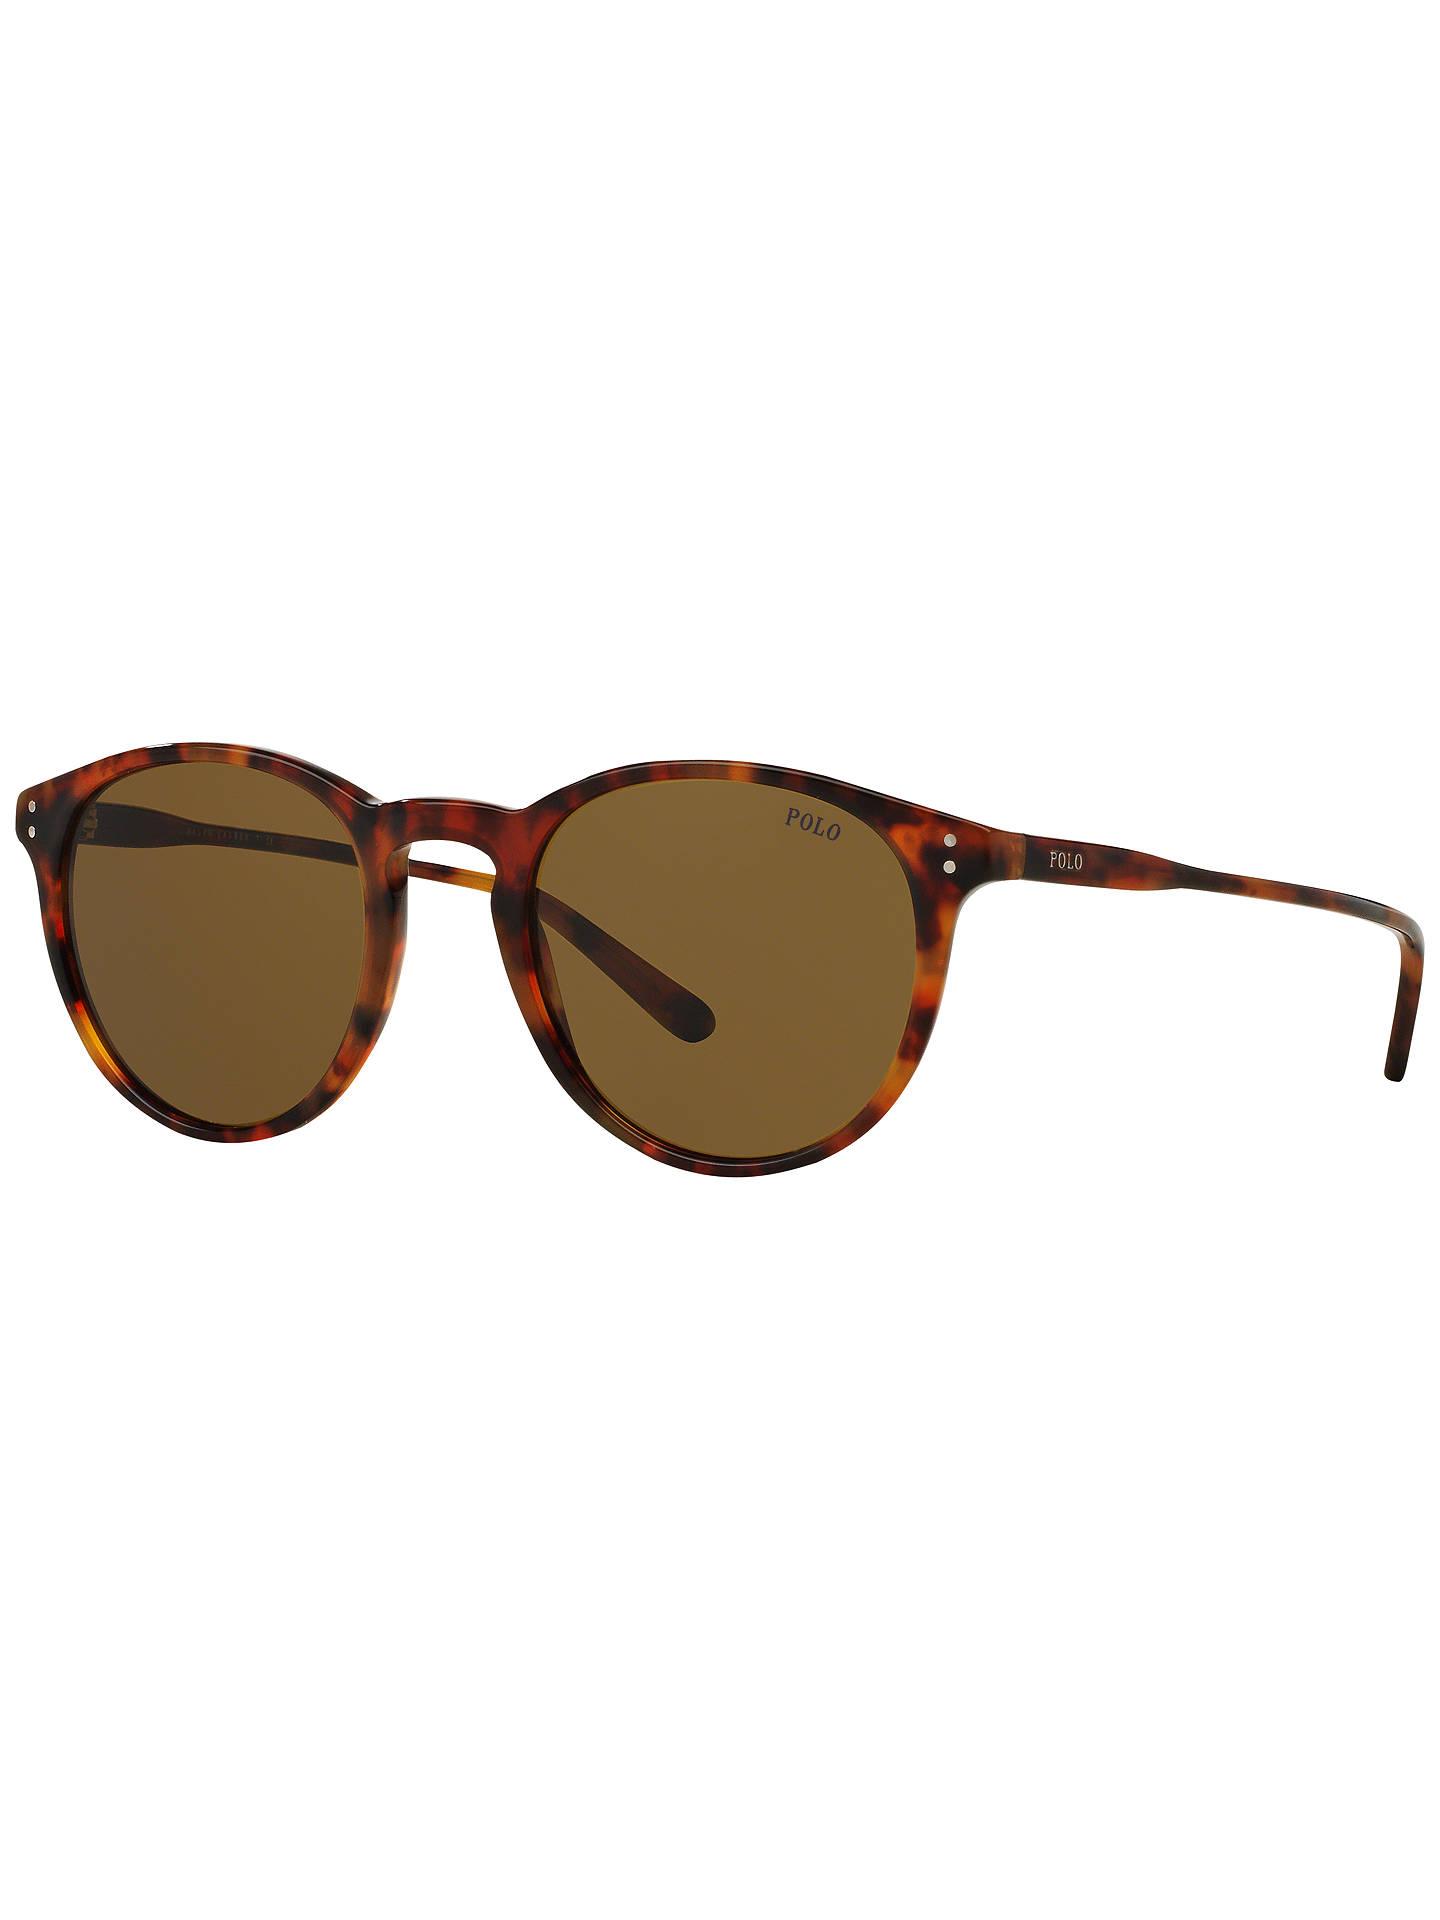 5d0b8e159d7ca Polo Ralph Lauren PH4110 Men s Oval Sunglasses at John Lewis   Partners